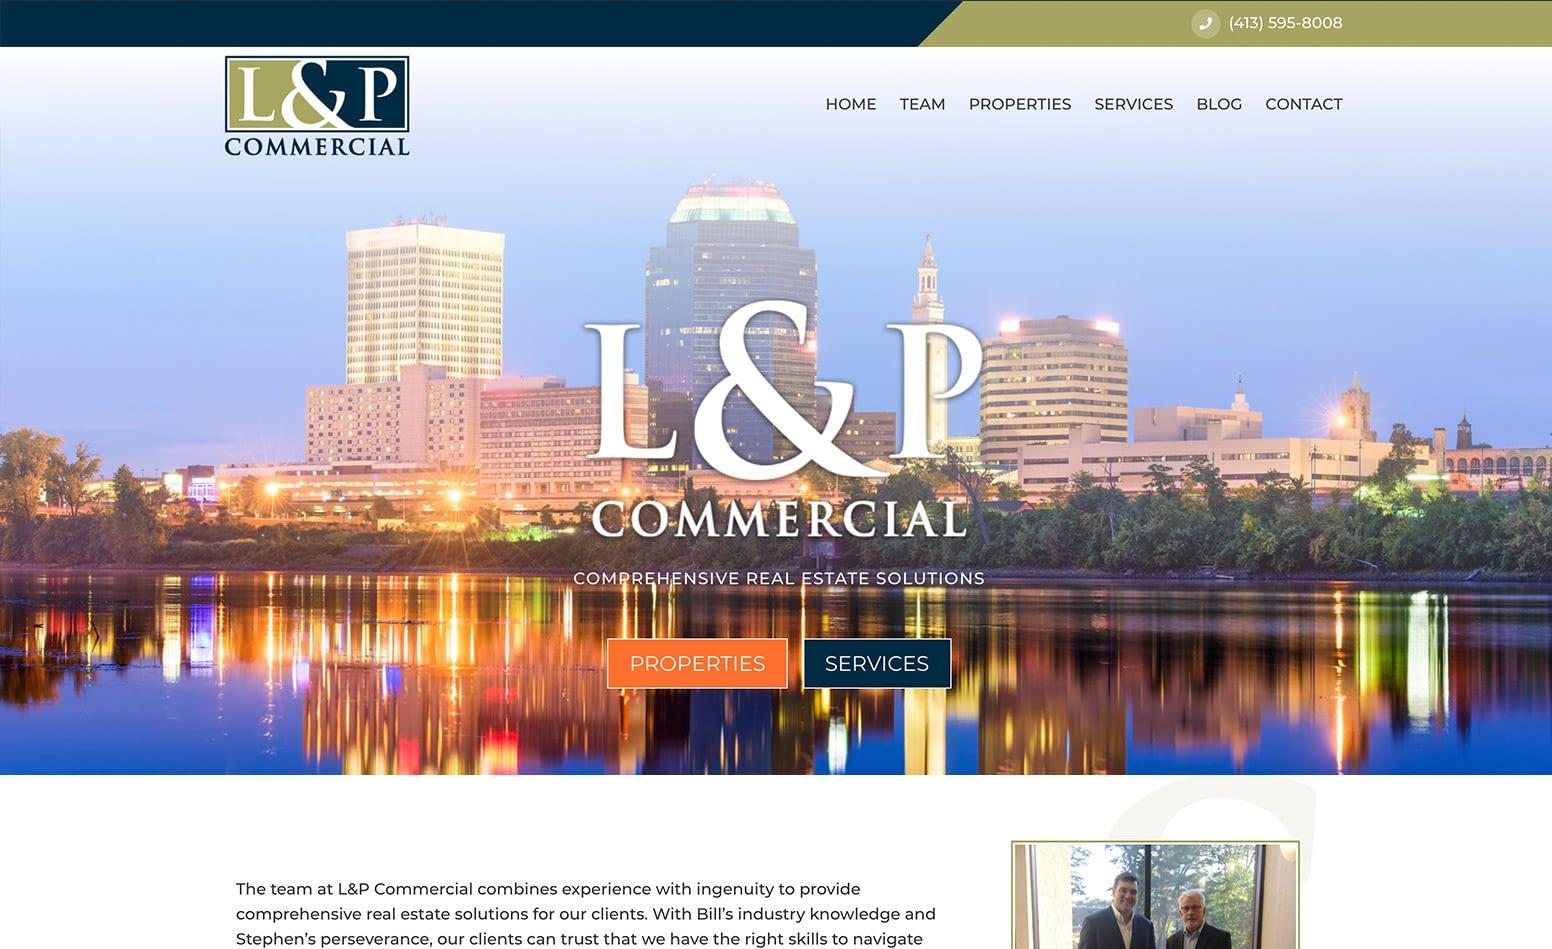 L&P Commercial website design, custom website design Western MA, website design Northern CT, branding, social media marketing MA